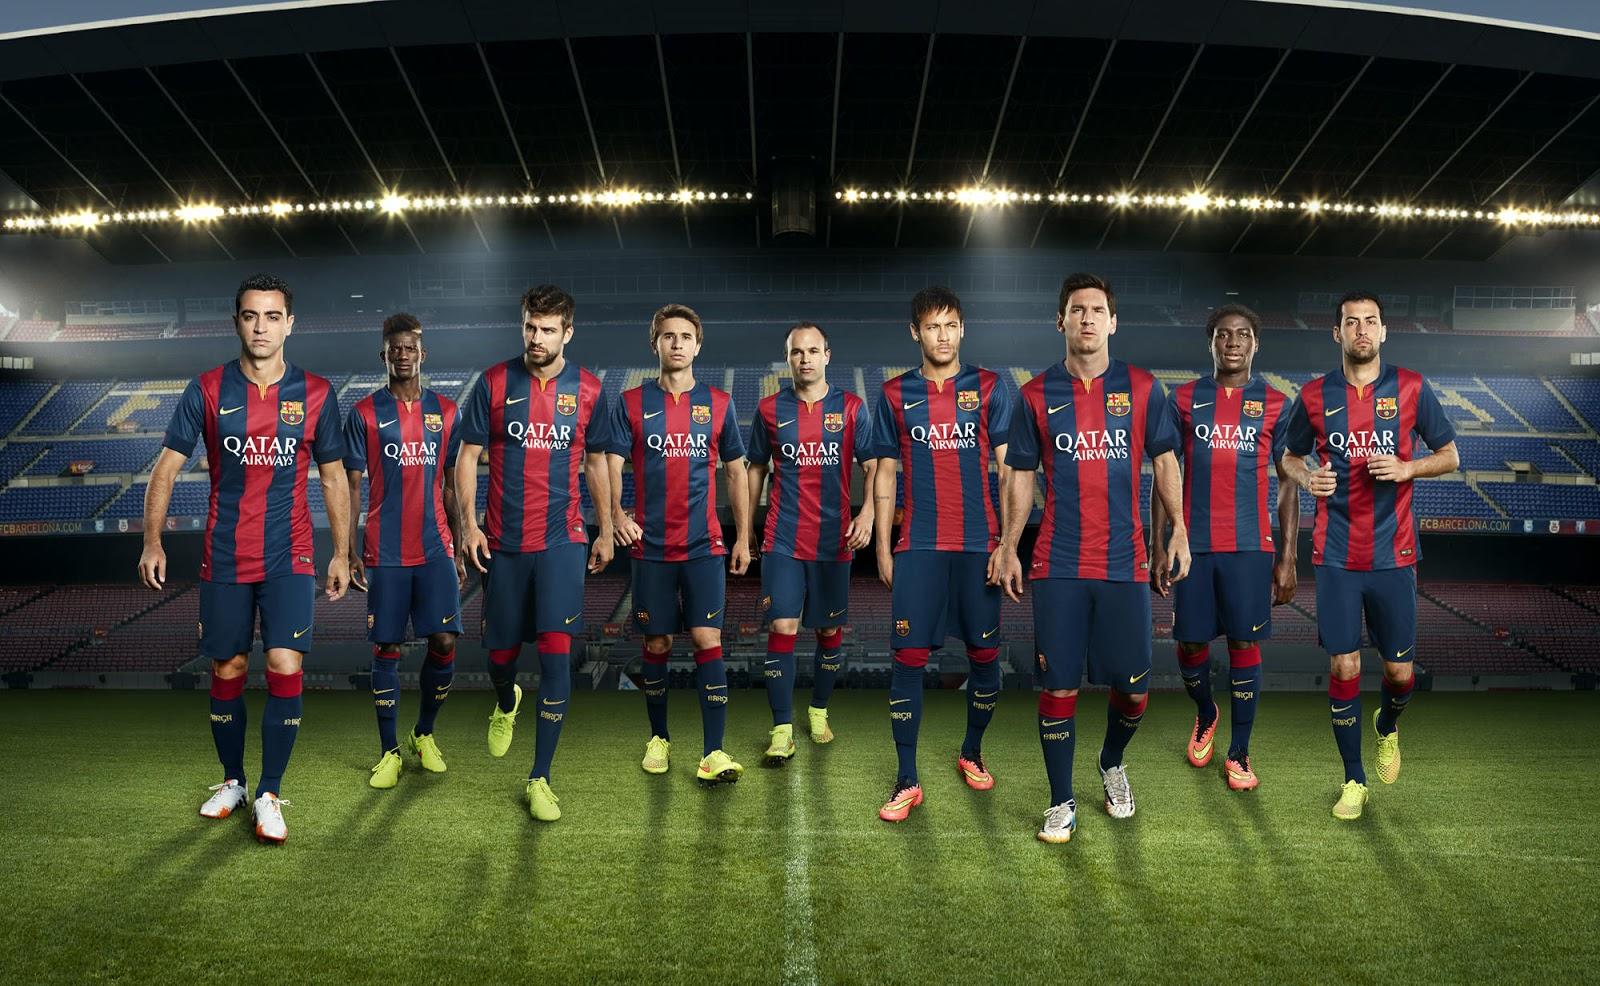 FC Barcelona 14-15 (2014-15) Home, Away and Third Kits - Footy Headlines